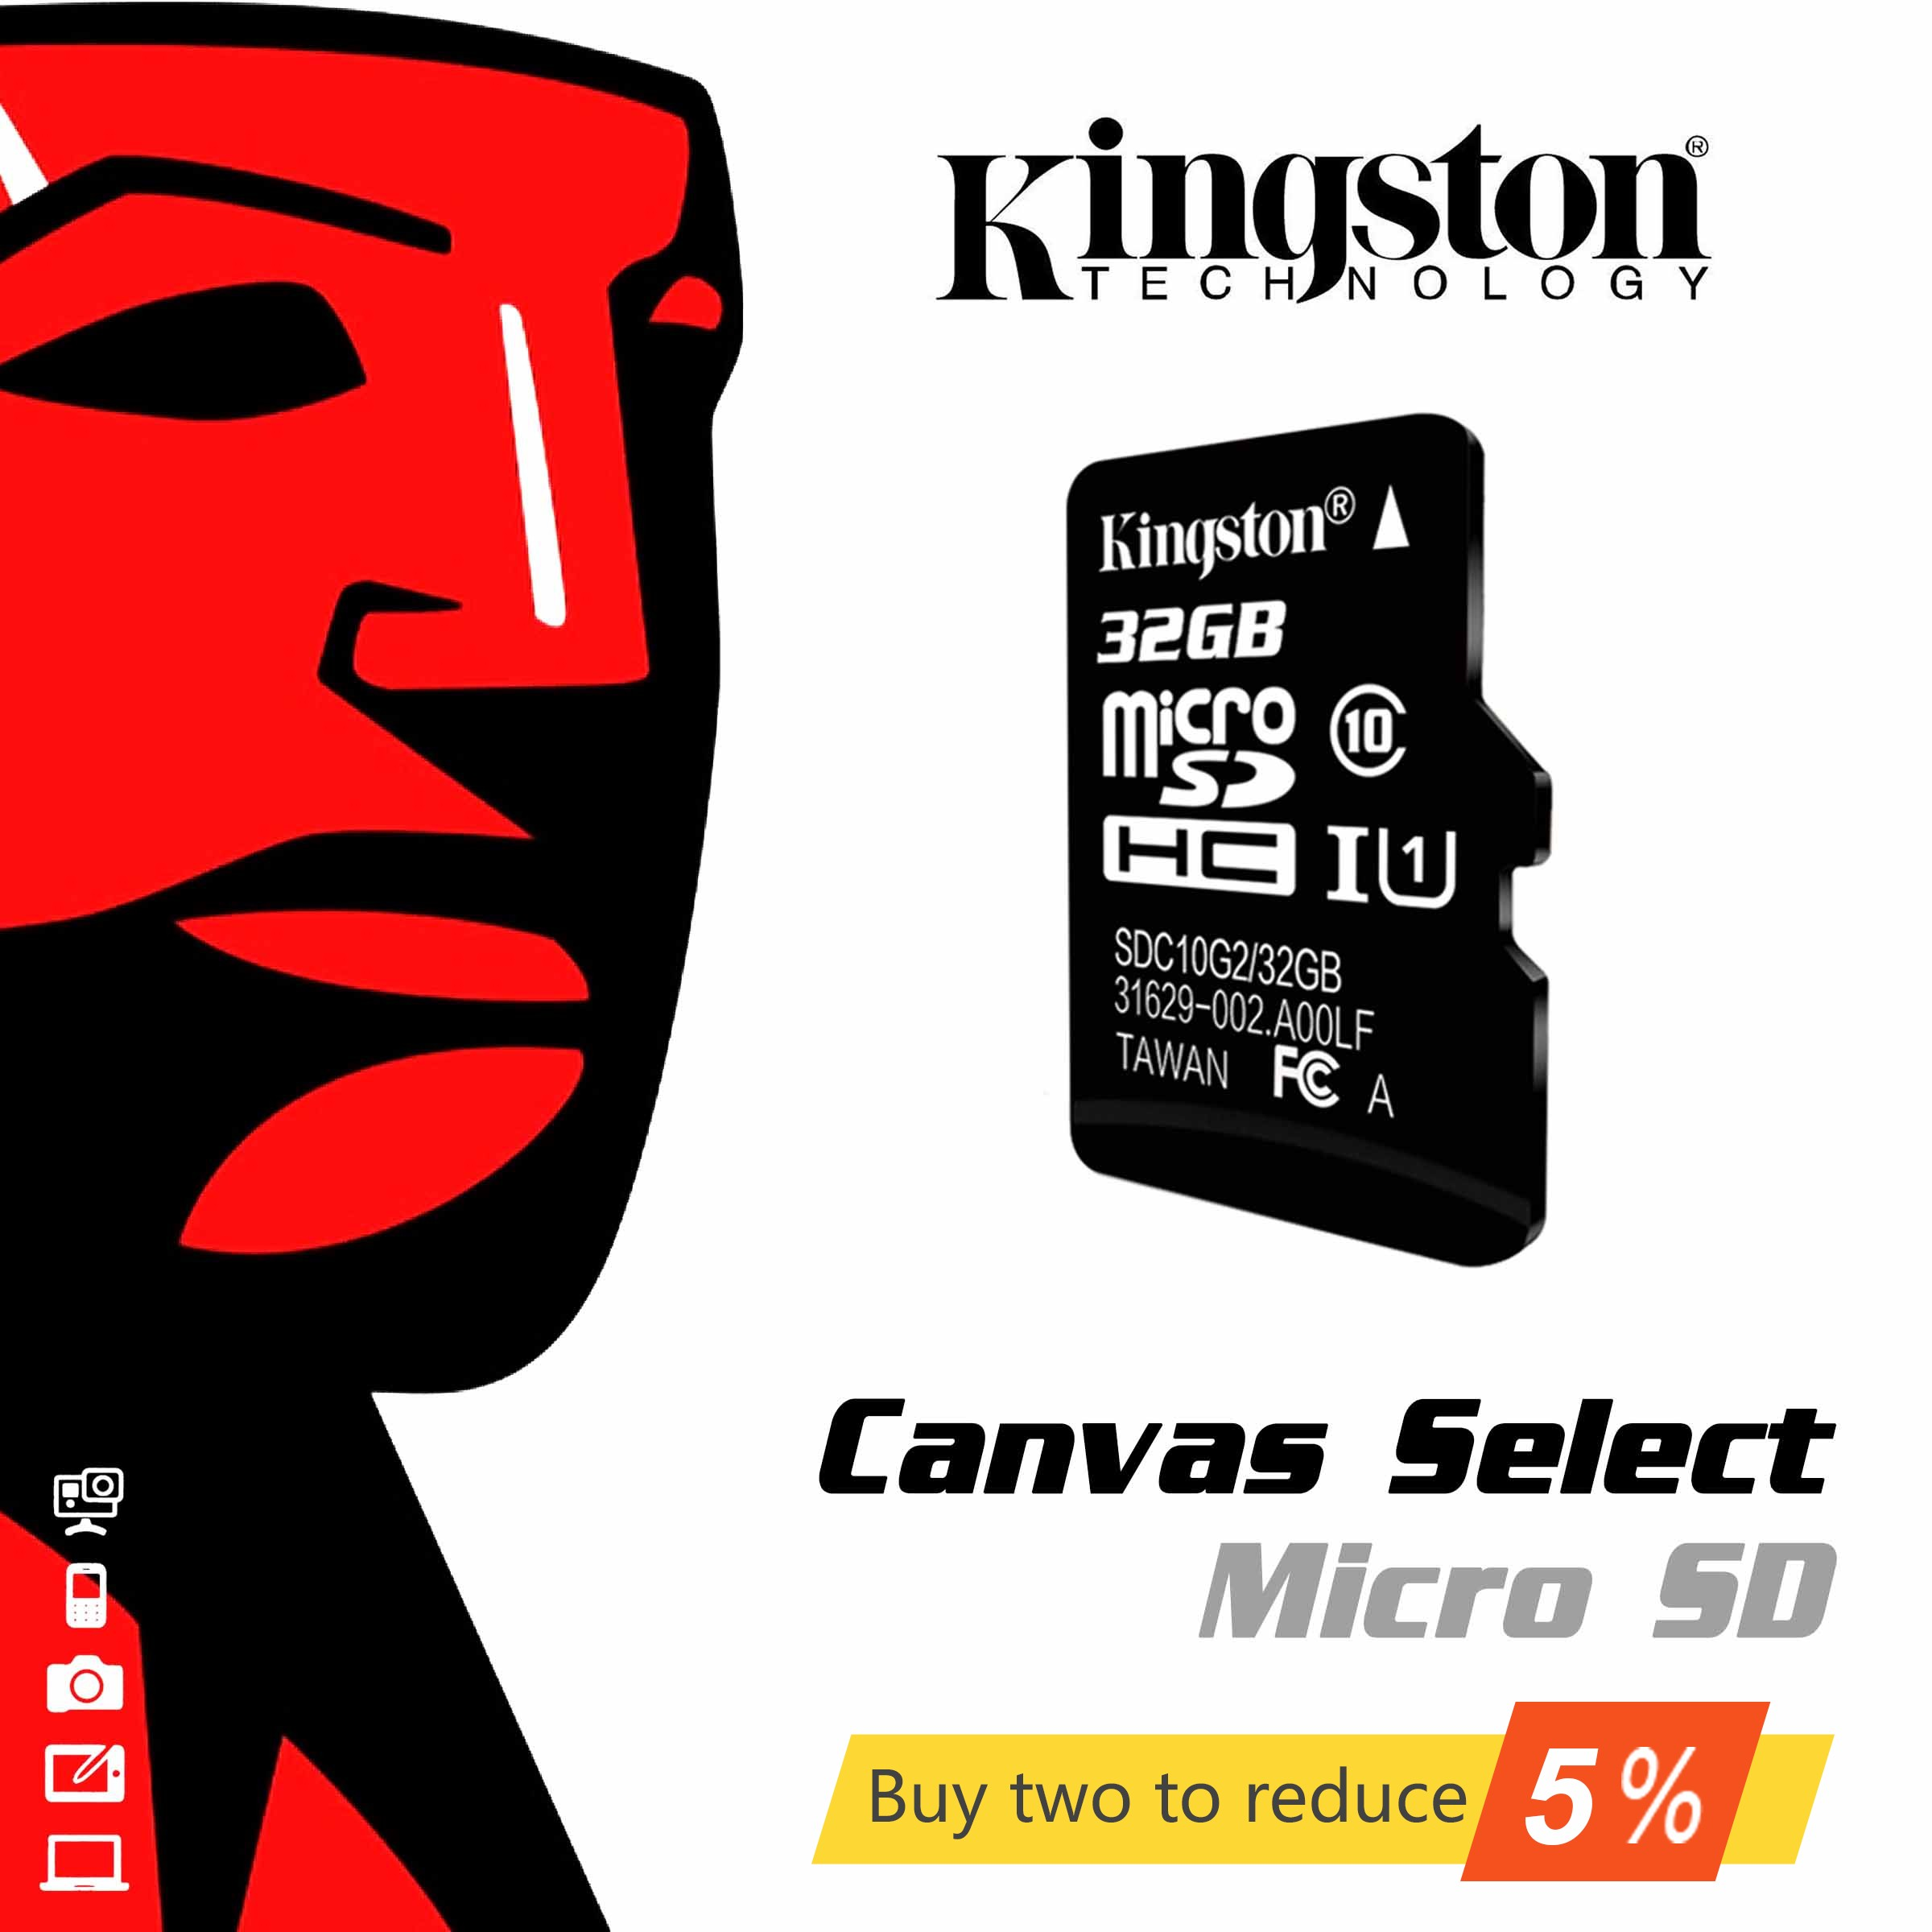 Оригинальный kingston класс 10 Micro SD карта 32 Гб MicroSDHC карта памяти UHS-I TF карта 8 ГБ 16 ГБ 32 ГБ 64 Гб 128 ГБ